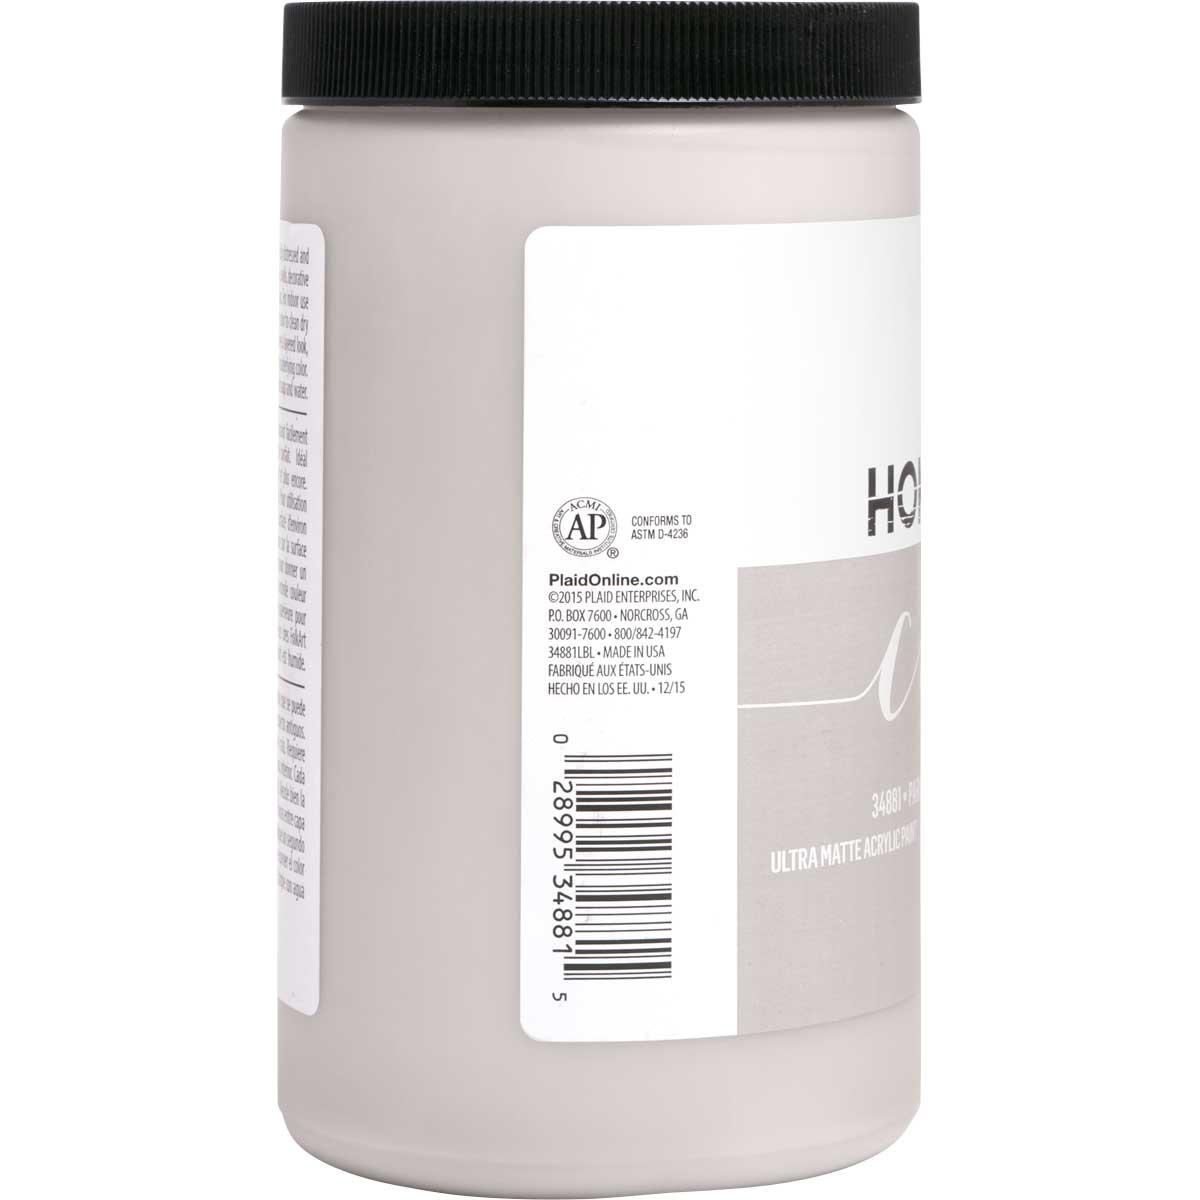 FolkArt ® Home Decor™ Chalk - Parisian Grey, 32 oz. - 34881